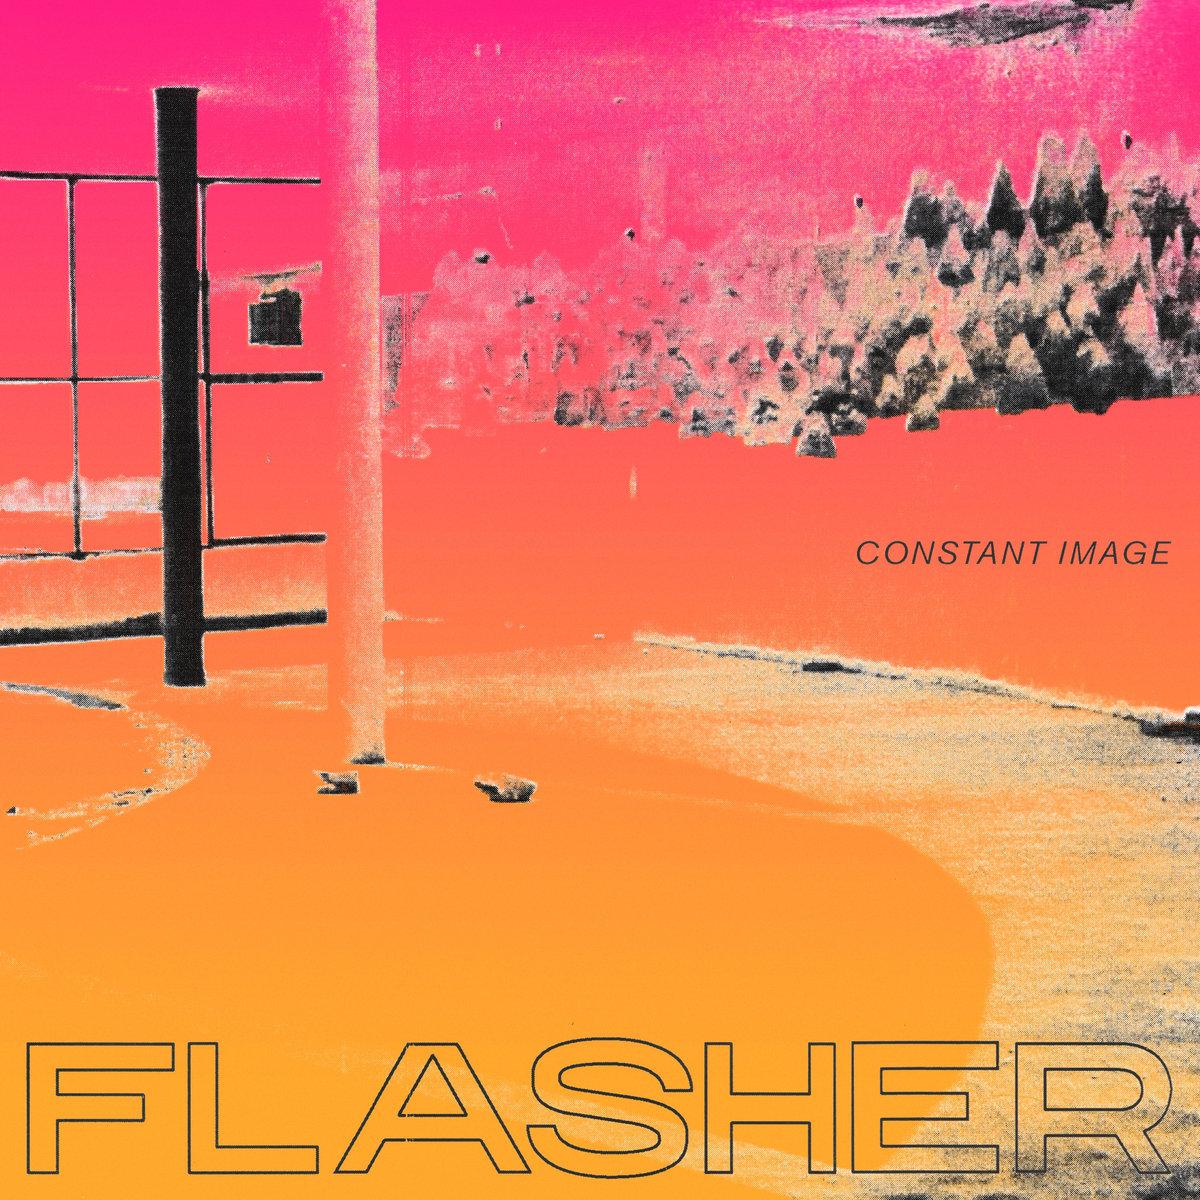 Flasher.jpg